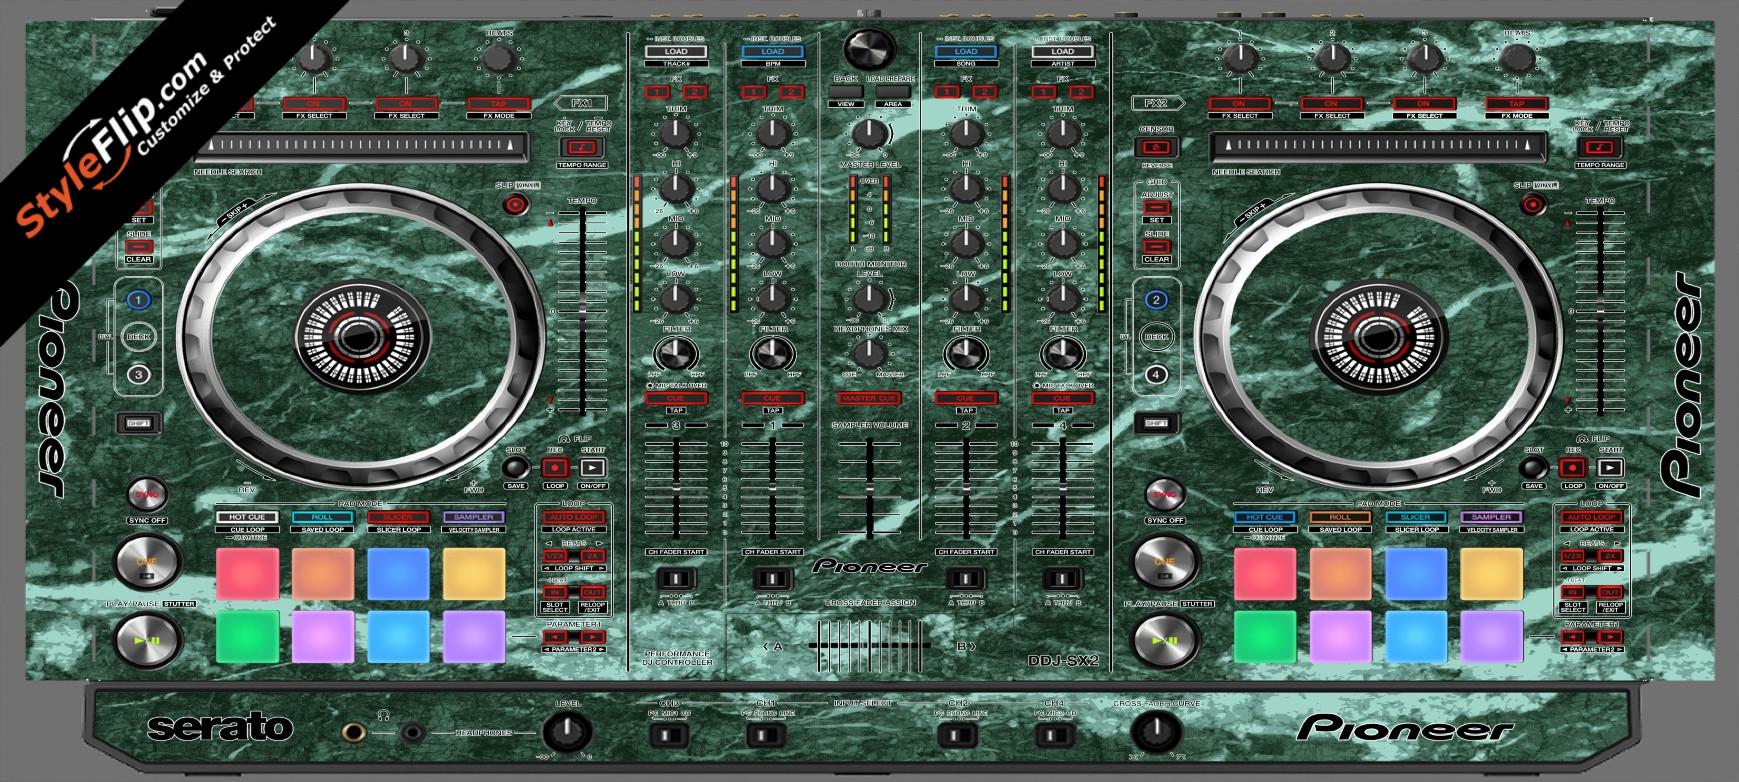 Green Marble Pioneer DDJ-SX2